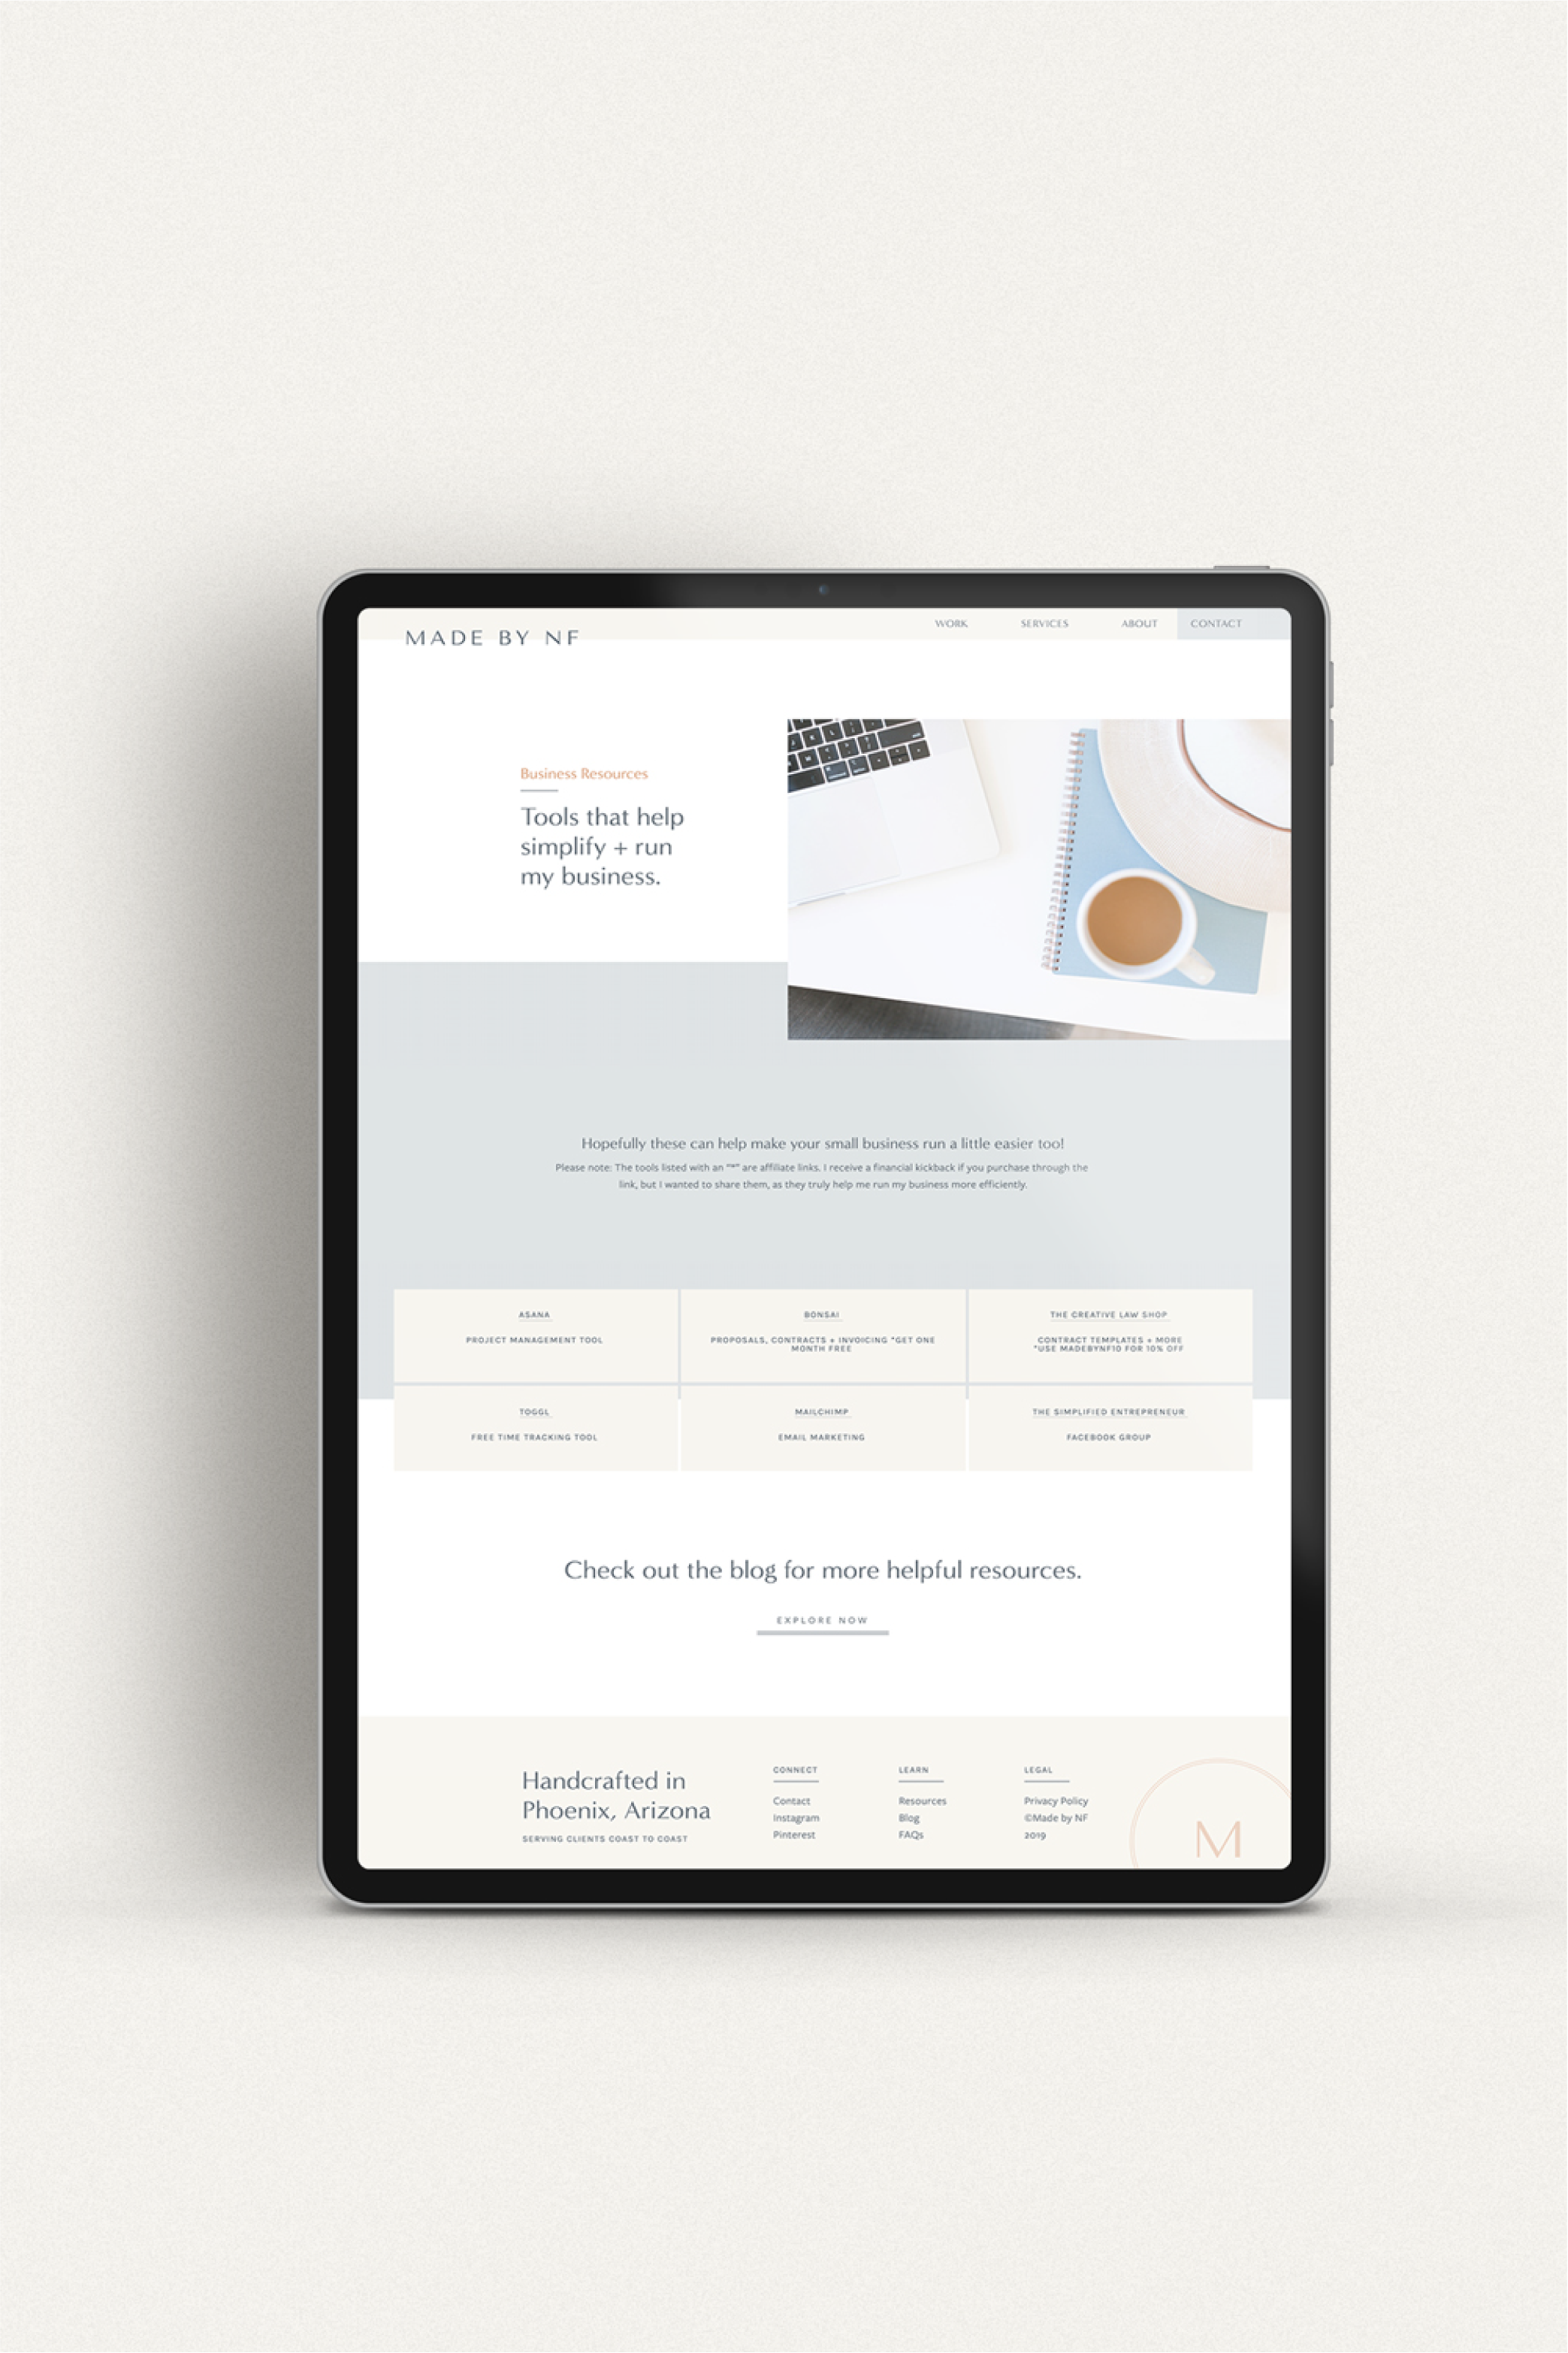 Catering Website Design Example Idea Collection Cemah Creative Llc Restaurant Website Design Food Web Design Website Design